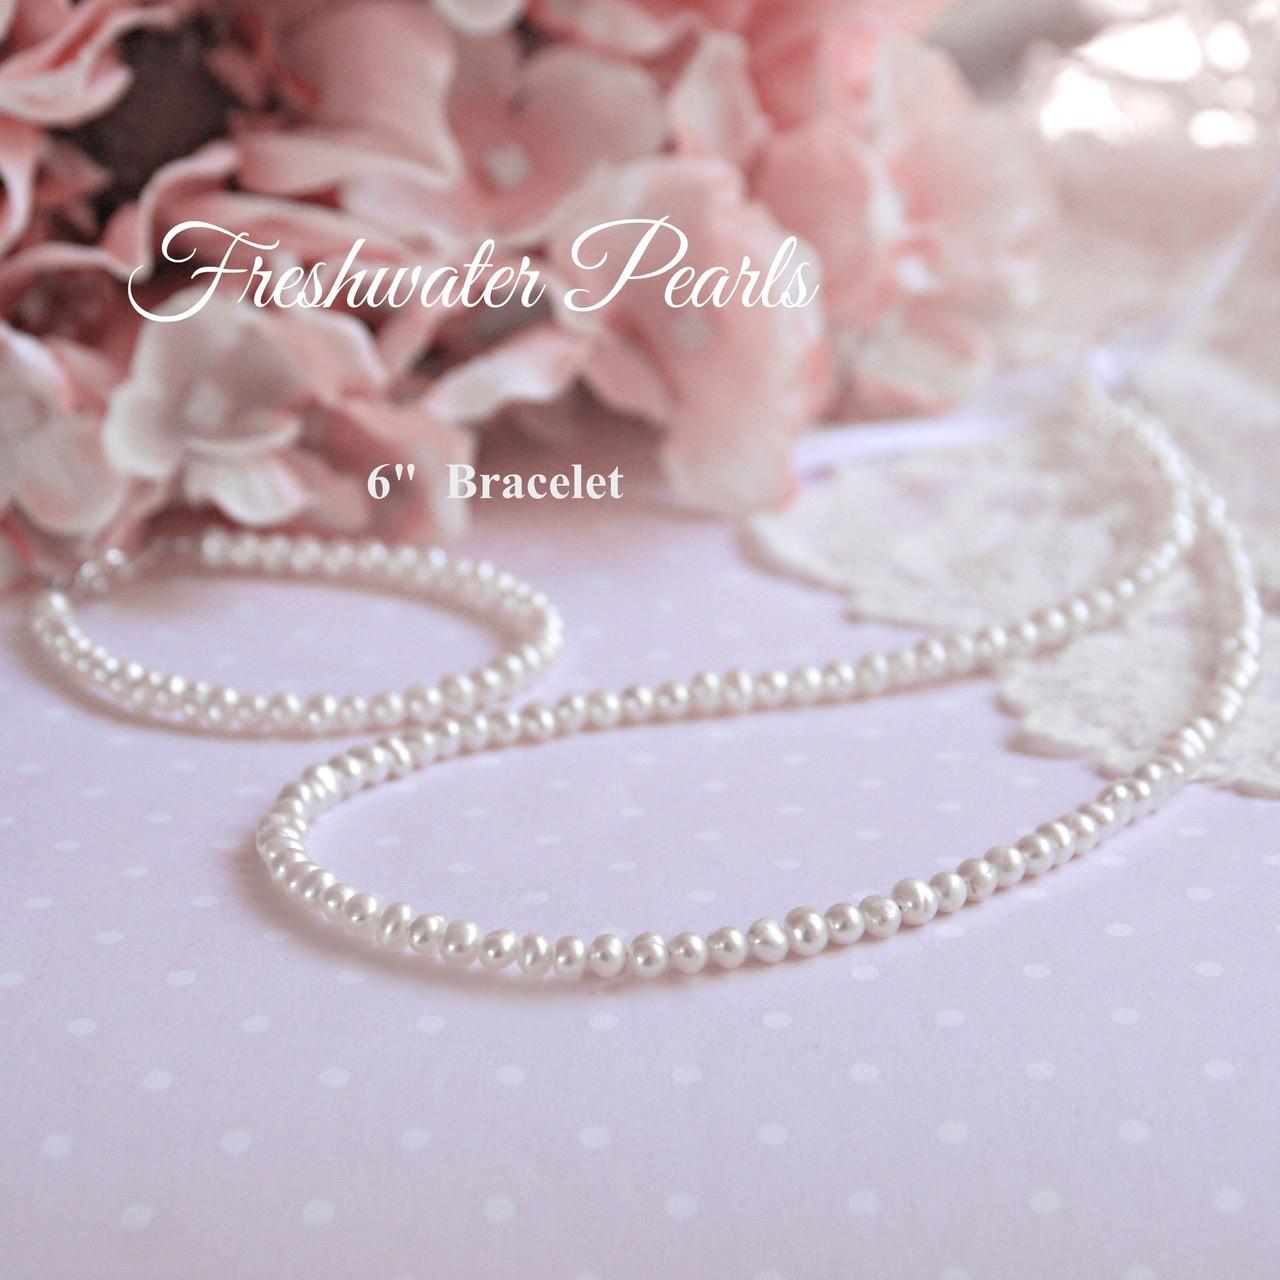 "STG-128  6"" Freshwater Pearls Child Bracelet"